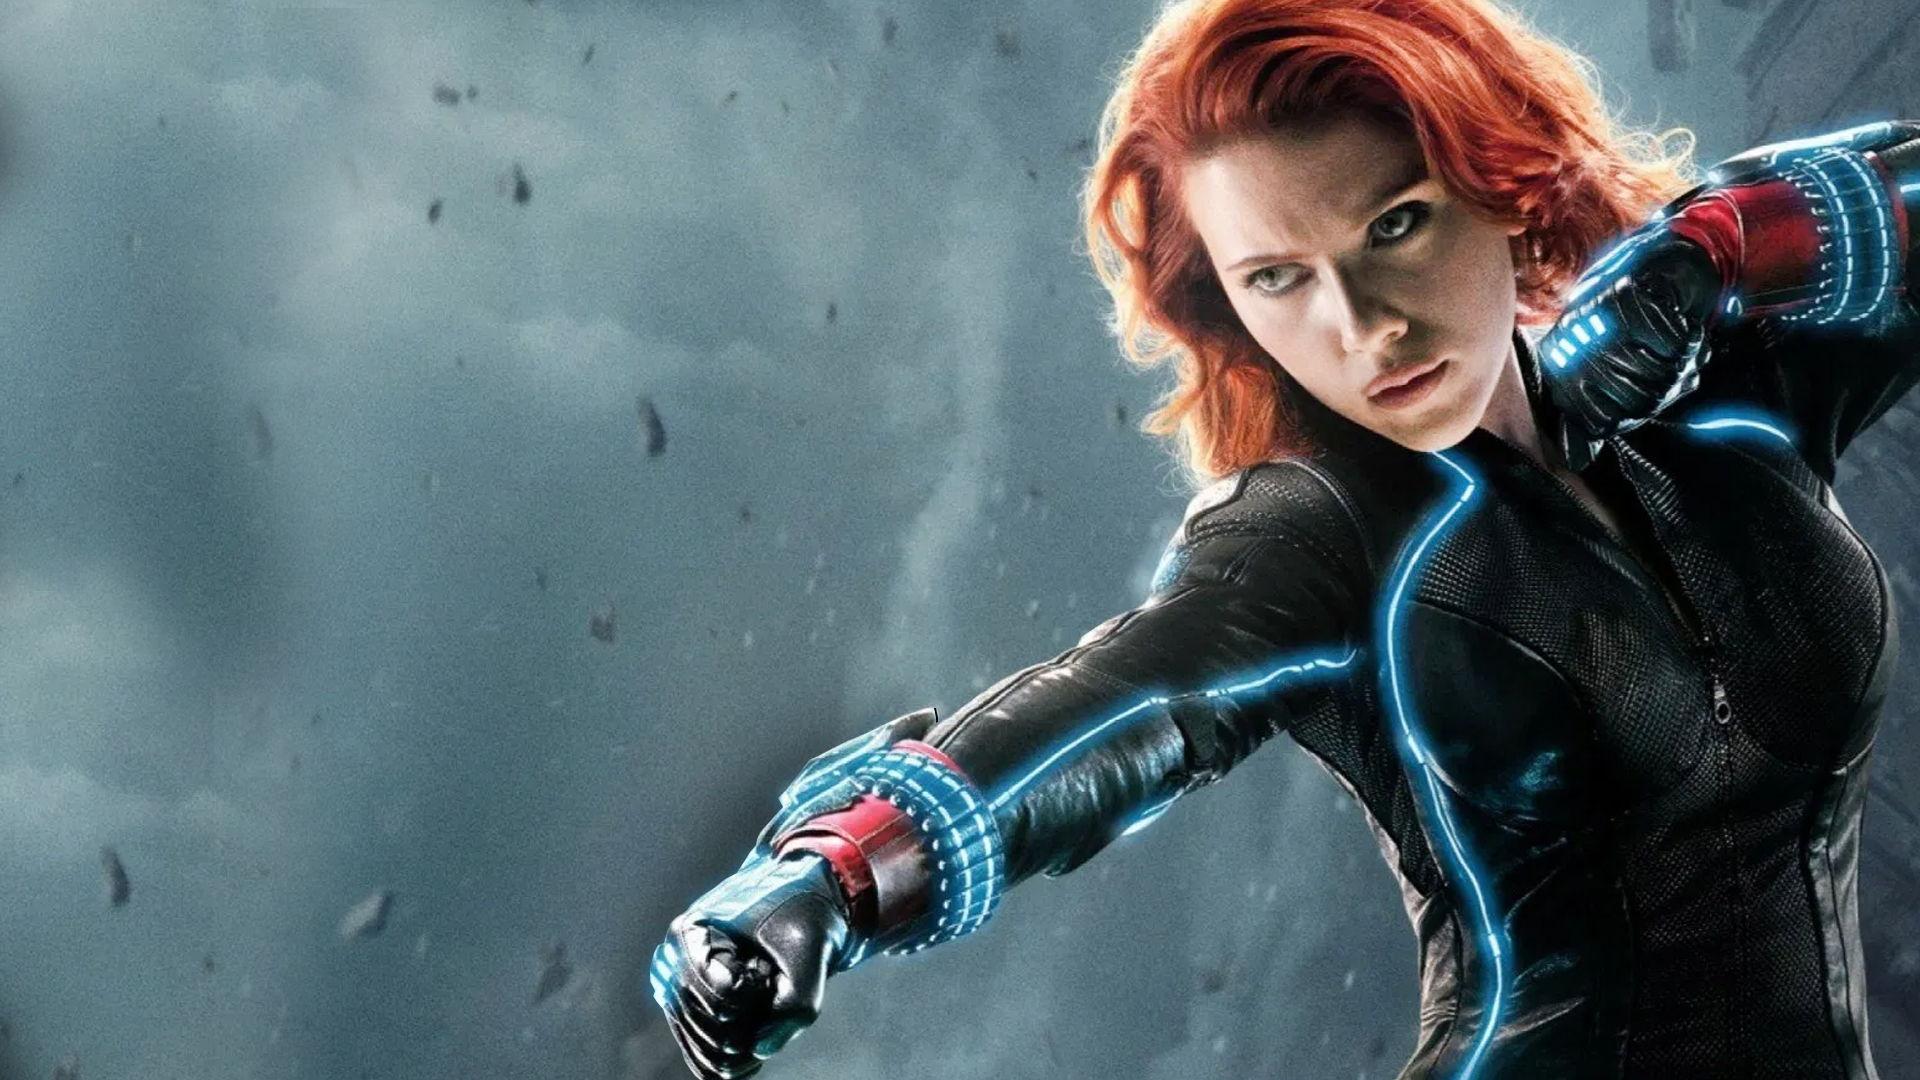 Watch Black Widow Full Hd Online Watch Black Widow 2020 Full Movie Online Free Gomovies